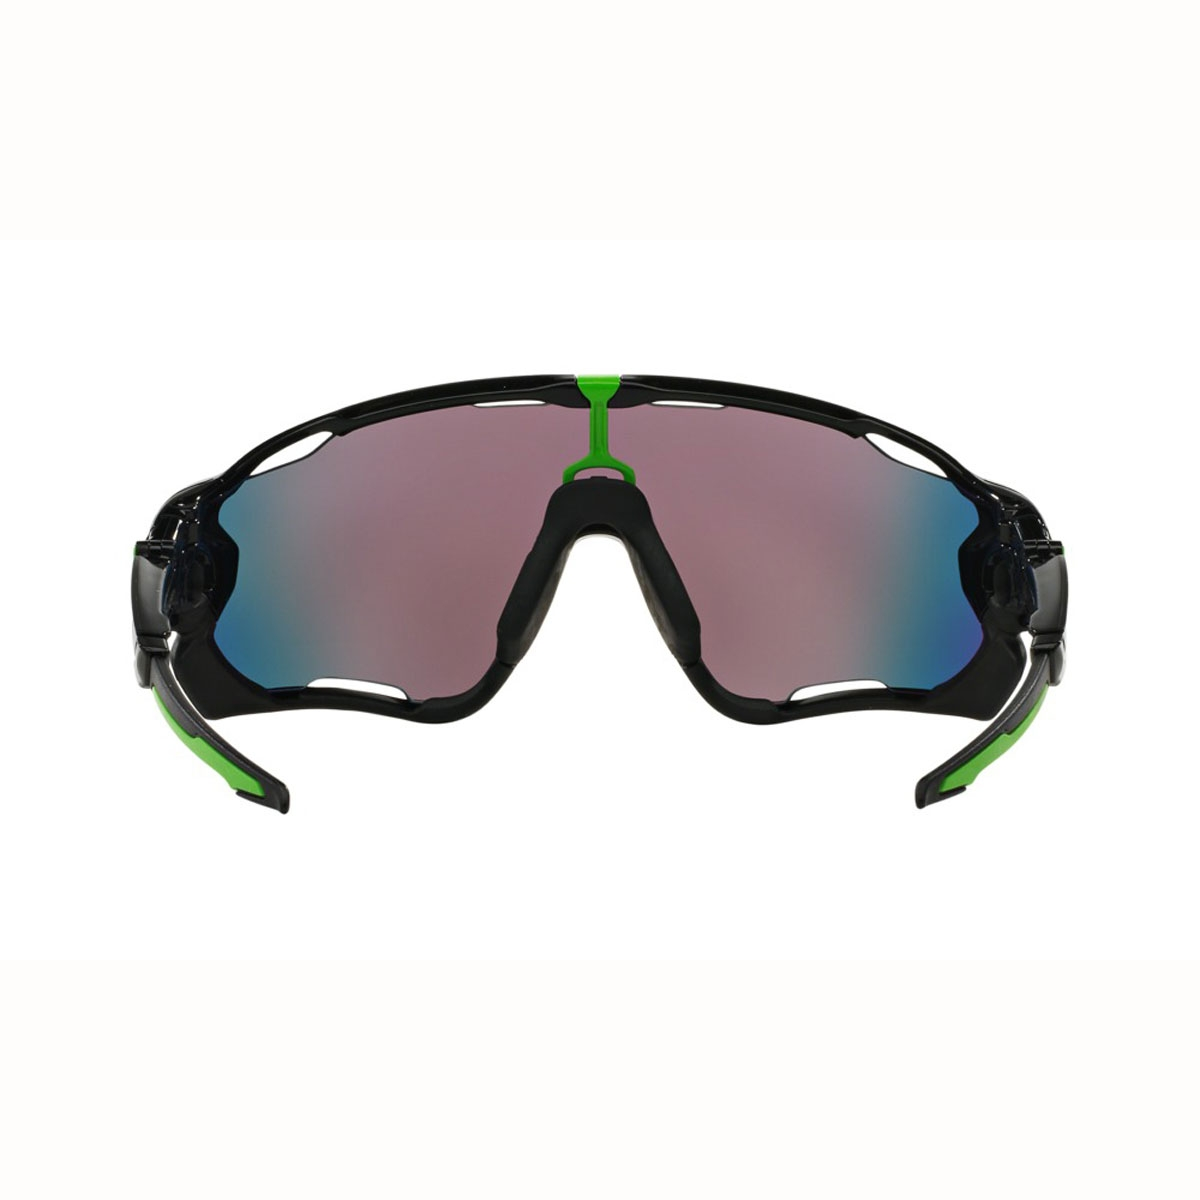 79408225675 ... Image of Oakley Jawbreaker Cavendish Sunglasses - Polished Black Prizm  Road Lens ...